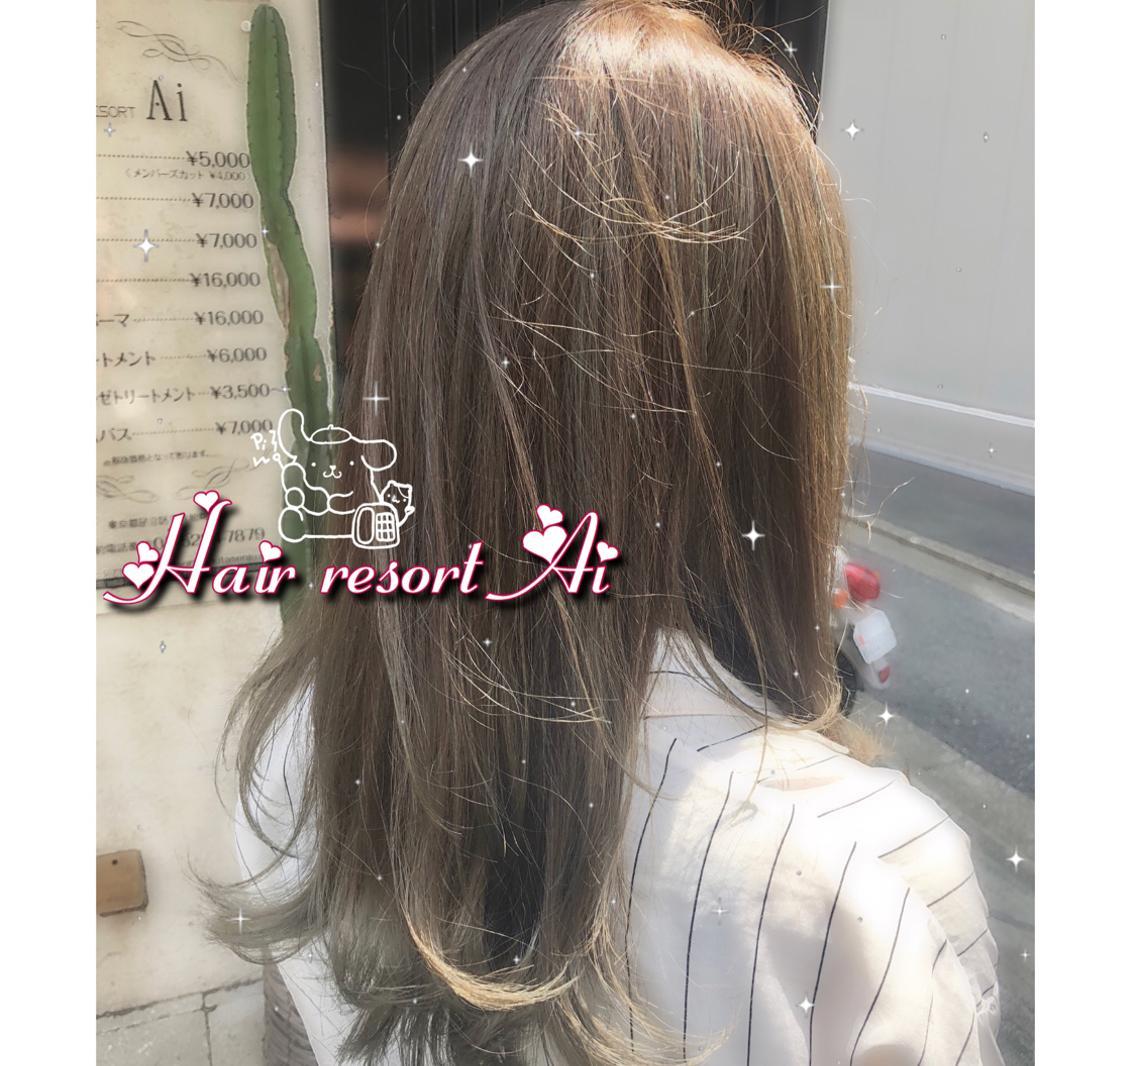 hairresortAi北千住所属・石井まいの掲載